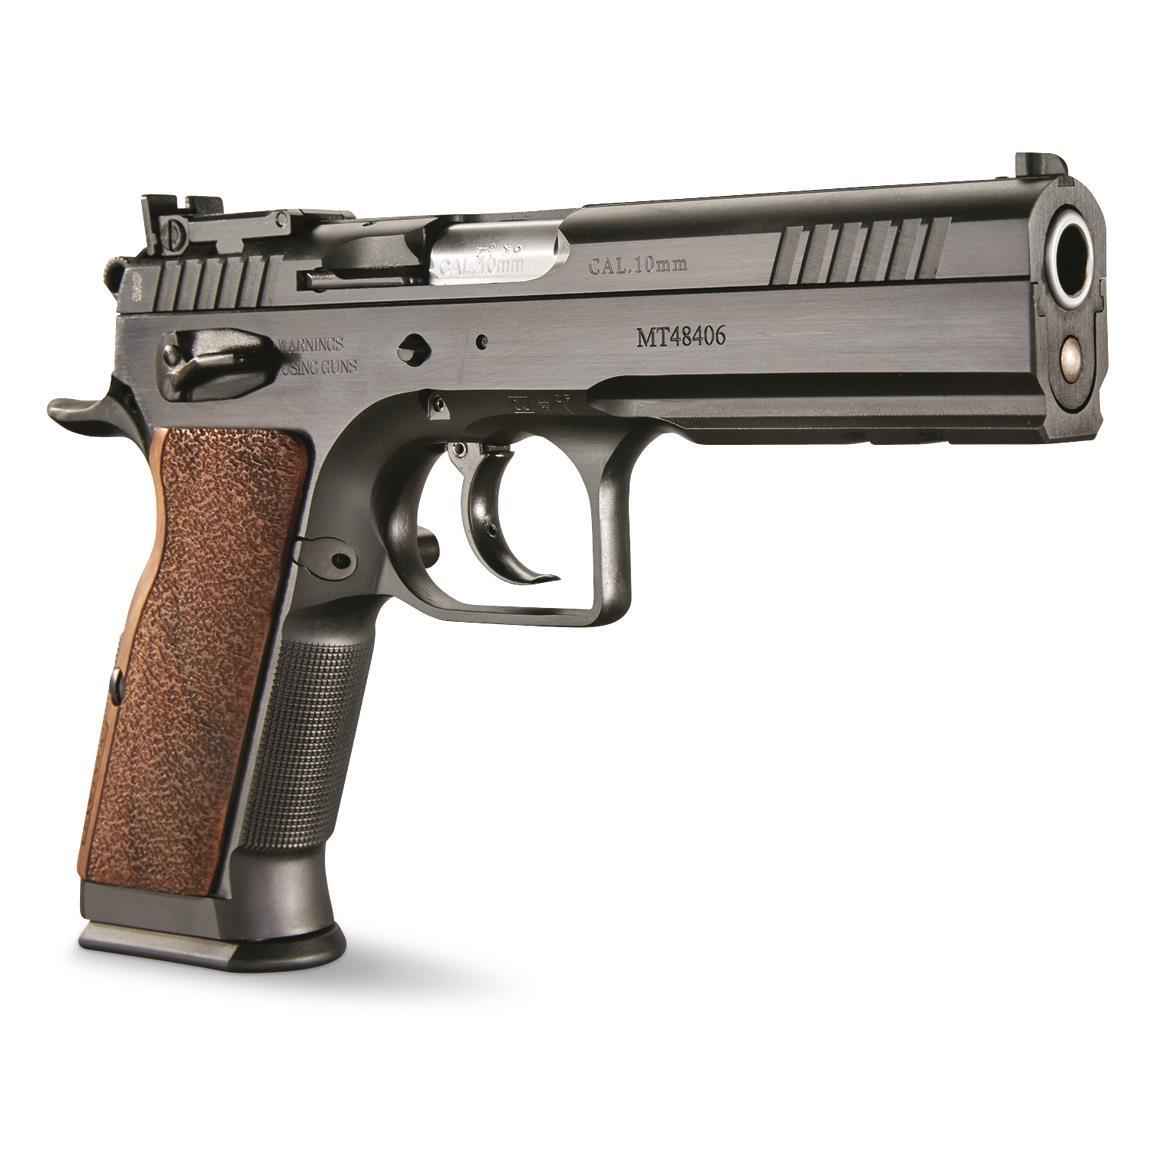 20 Best 10mm Handguns For Sale in 2019 – USA Gun Shop